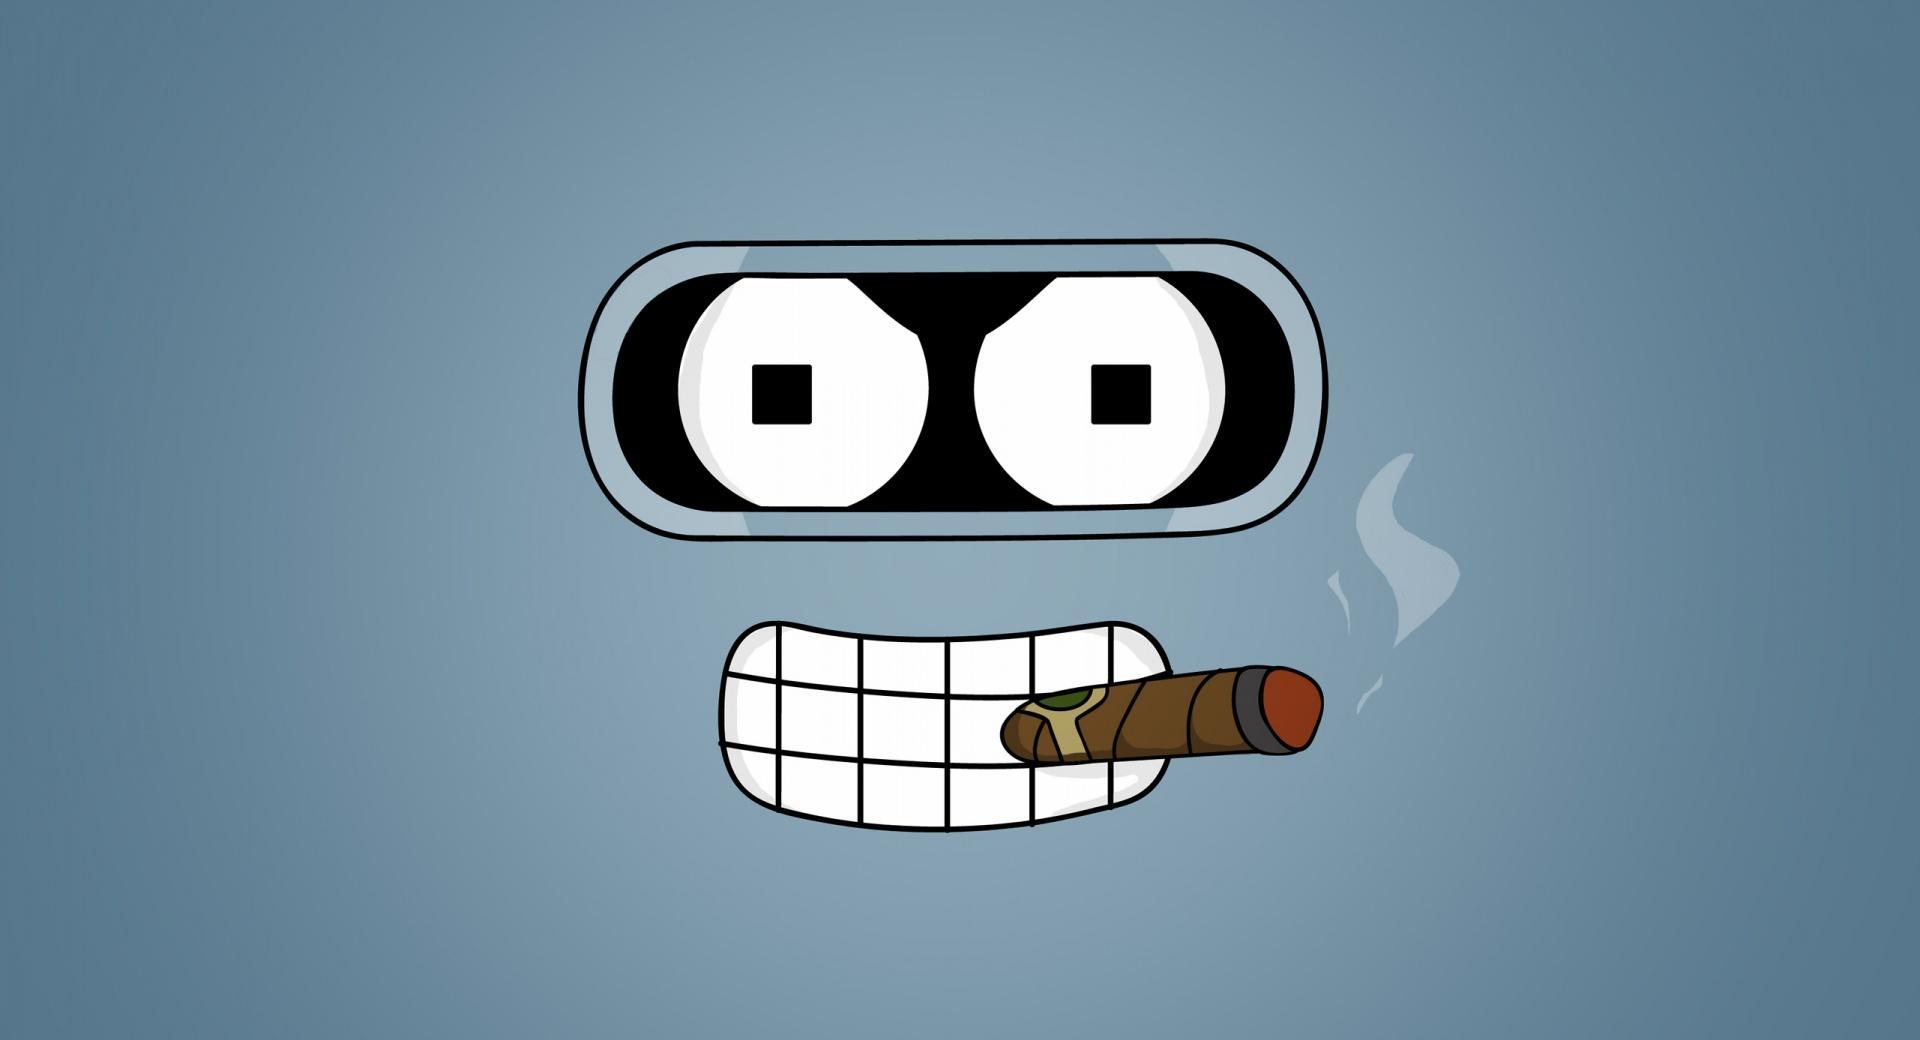 Futurama Bender Cigar wallpapers HD quality